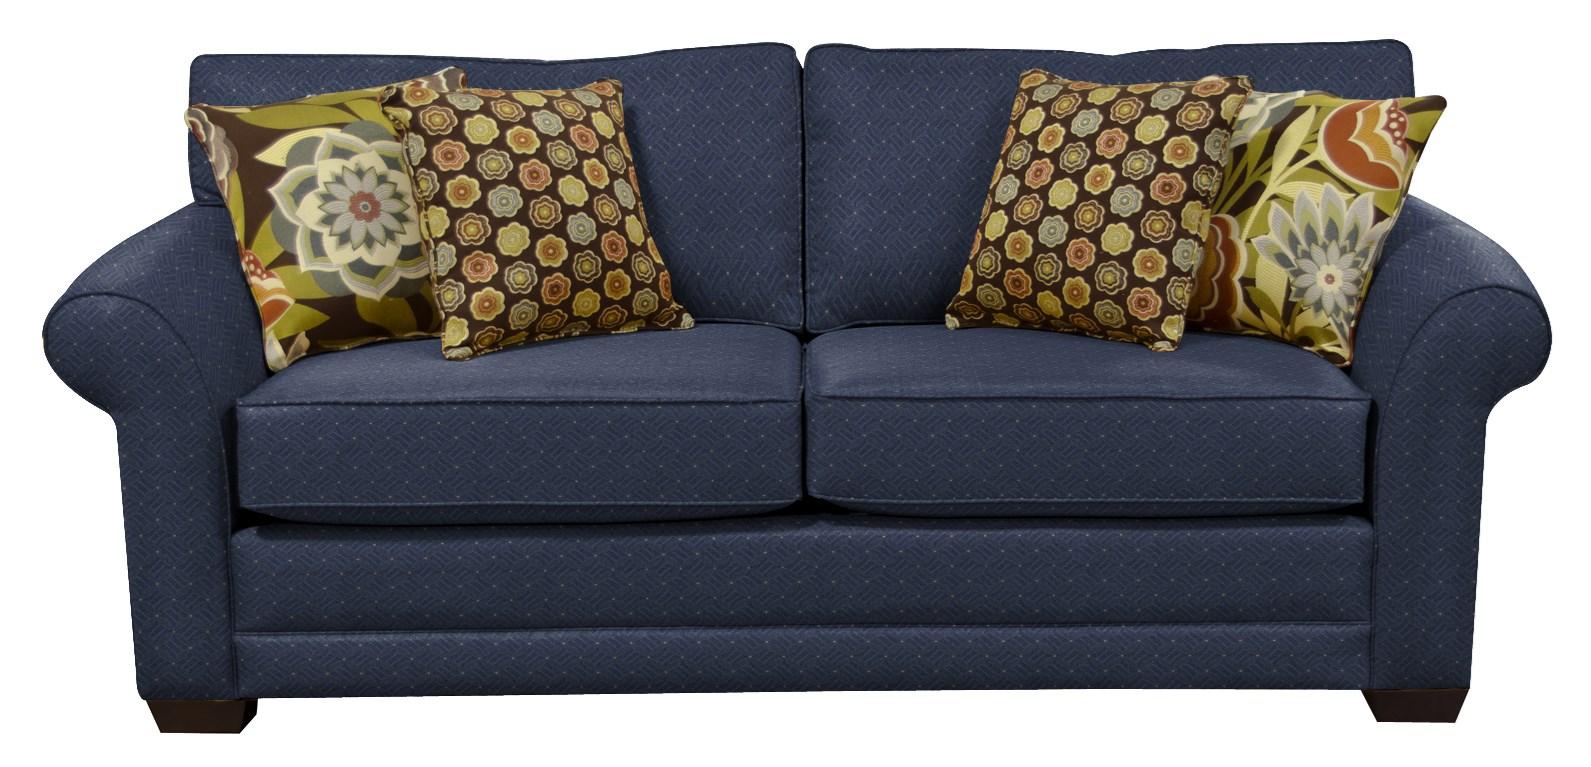 england brantley queen sleeper sofa with visco mattress lindy s rh lindysfurniture com england sleeper sofa with full size mattress england sleeper sofa with air mattress